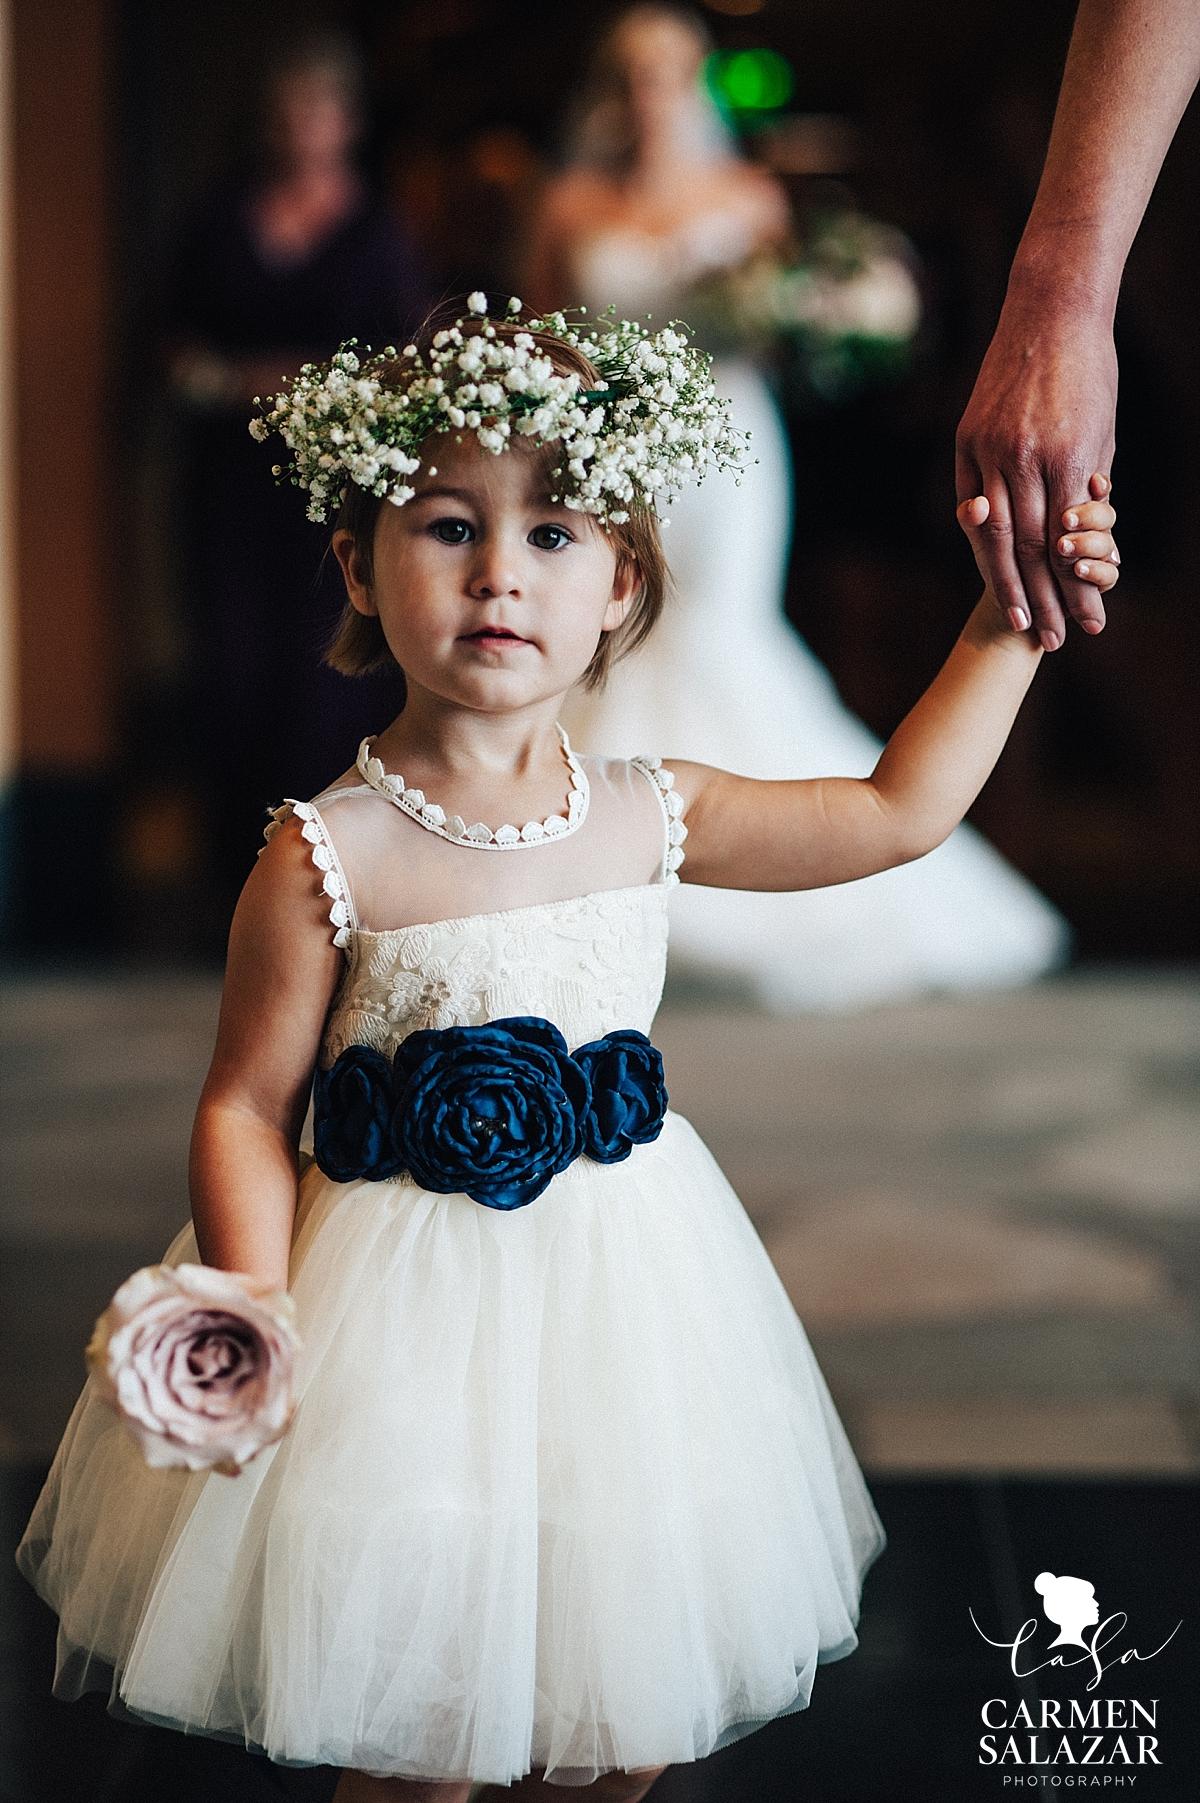 DIY flower crown for adorable flower girl - Carmen Salazar